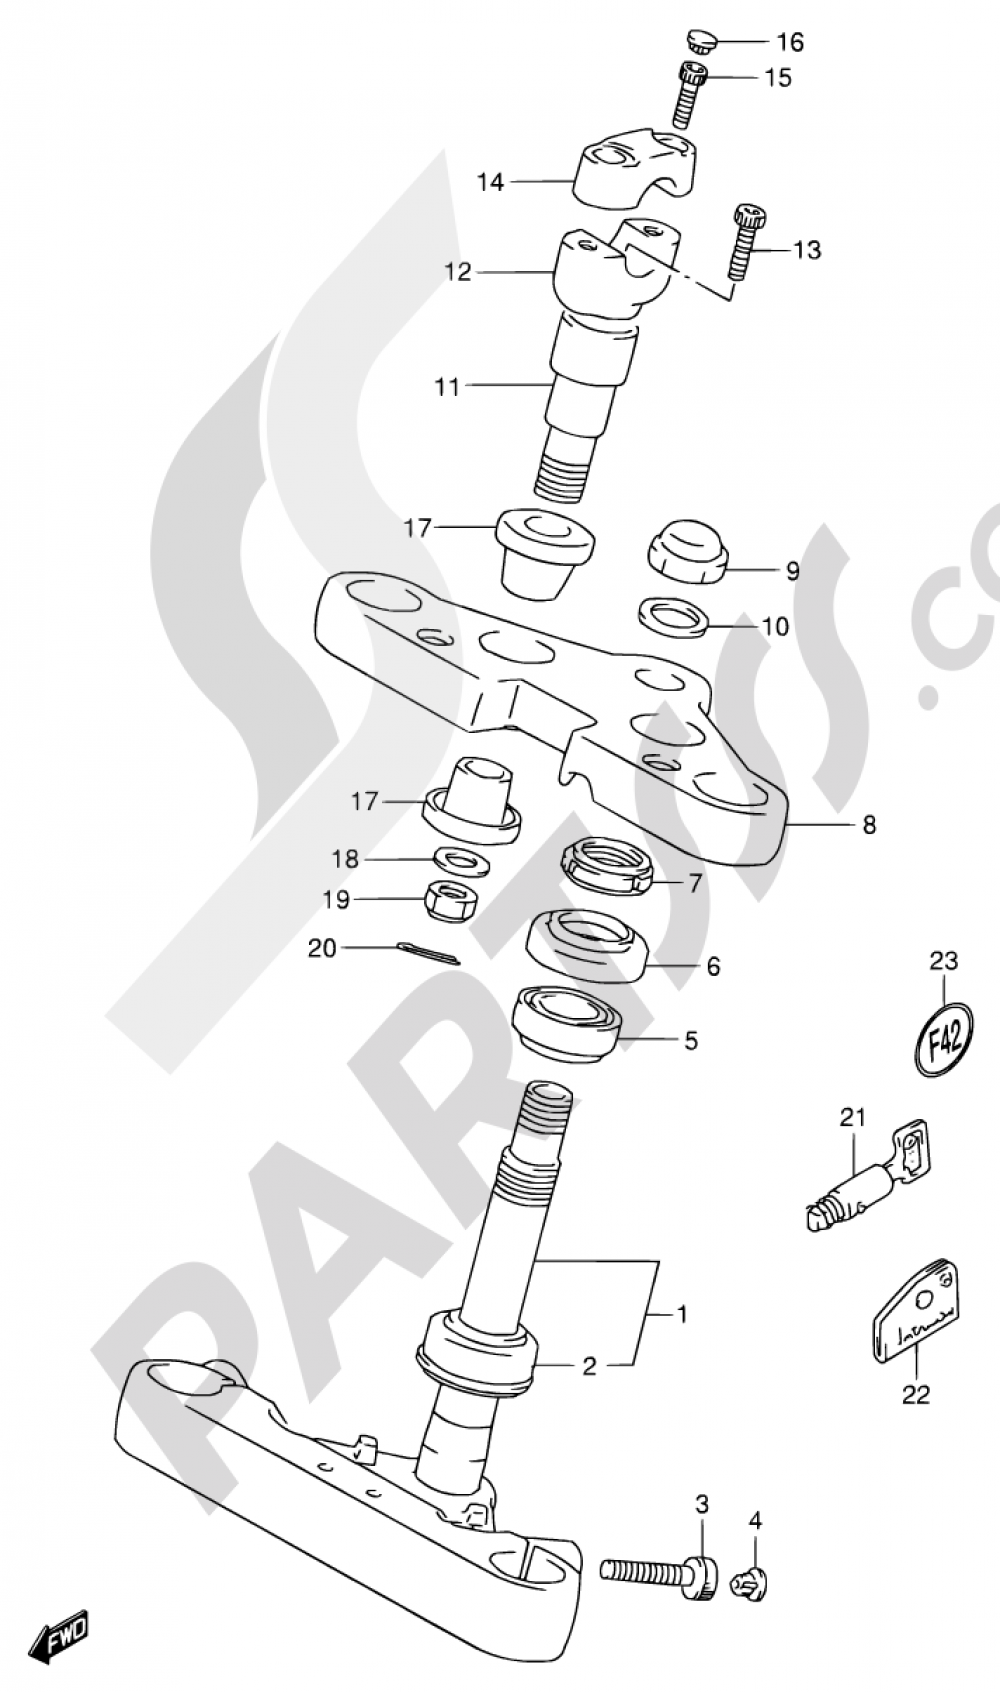 49 - STEERING STEM (MODEL N/P/R) Suzuki VS800GL 1992